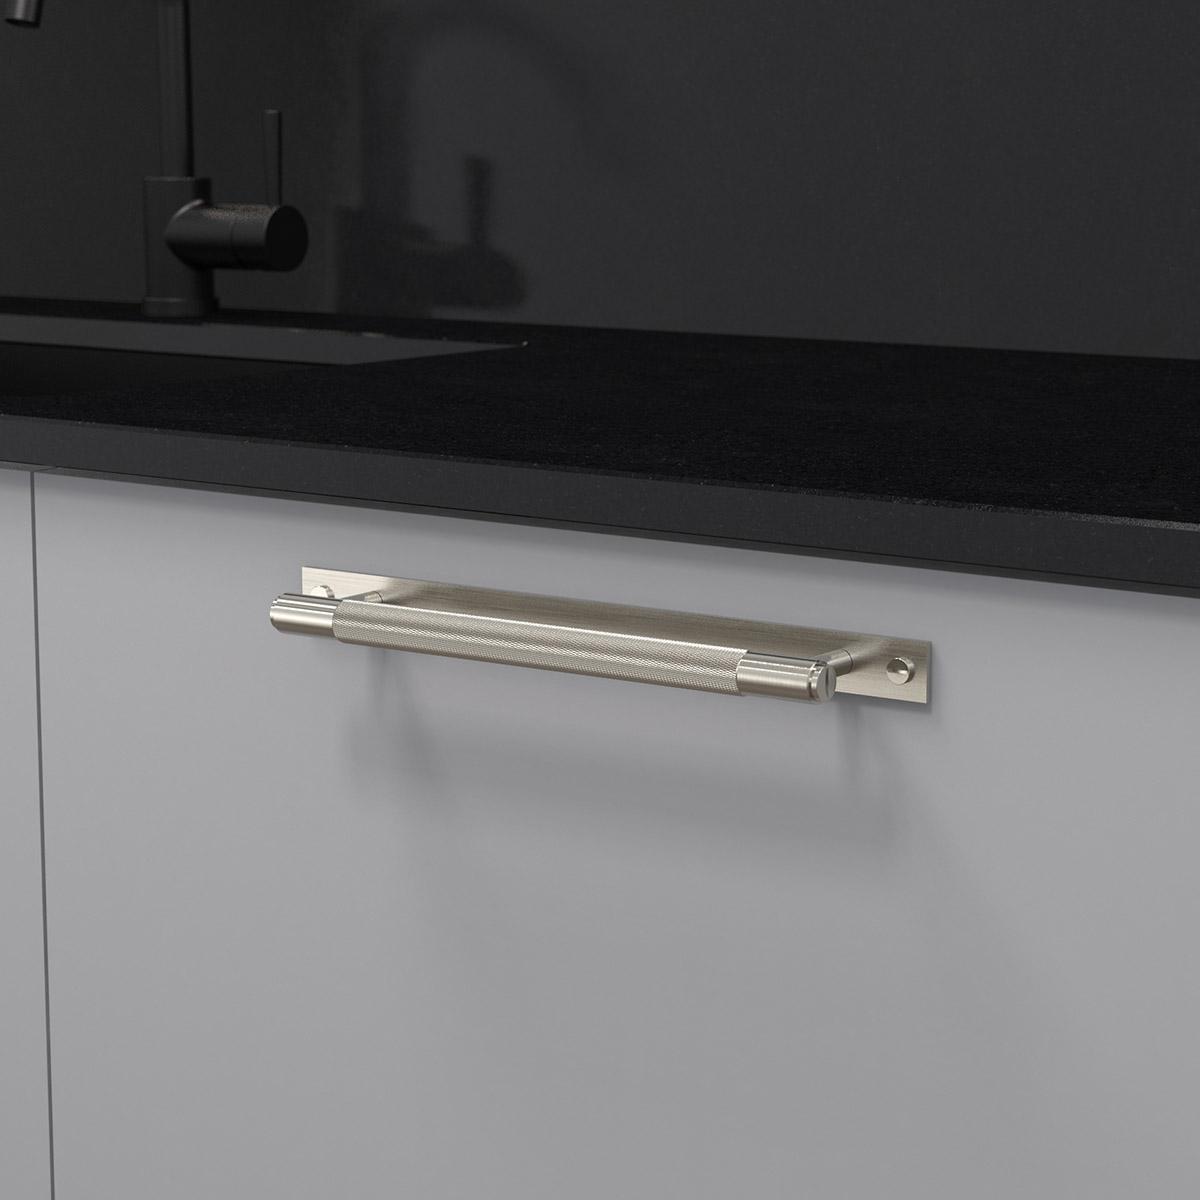 pull bar plate stål uk pb hp 260 st a cc 225 mm ncs s 3000 n granit svart